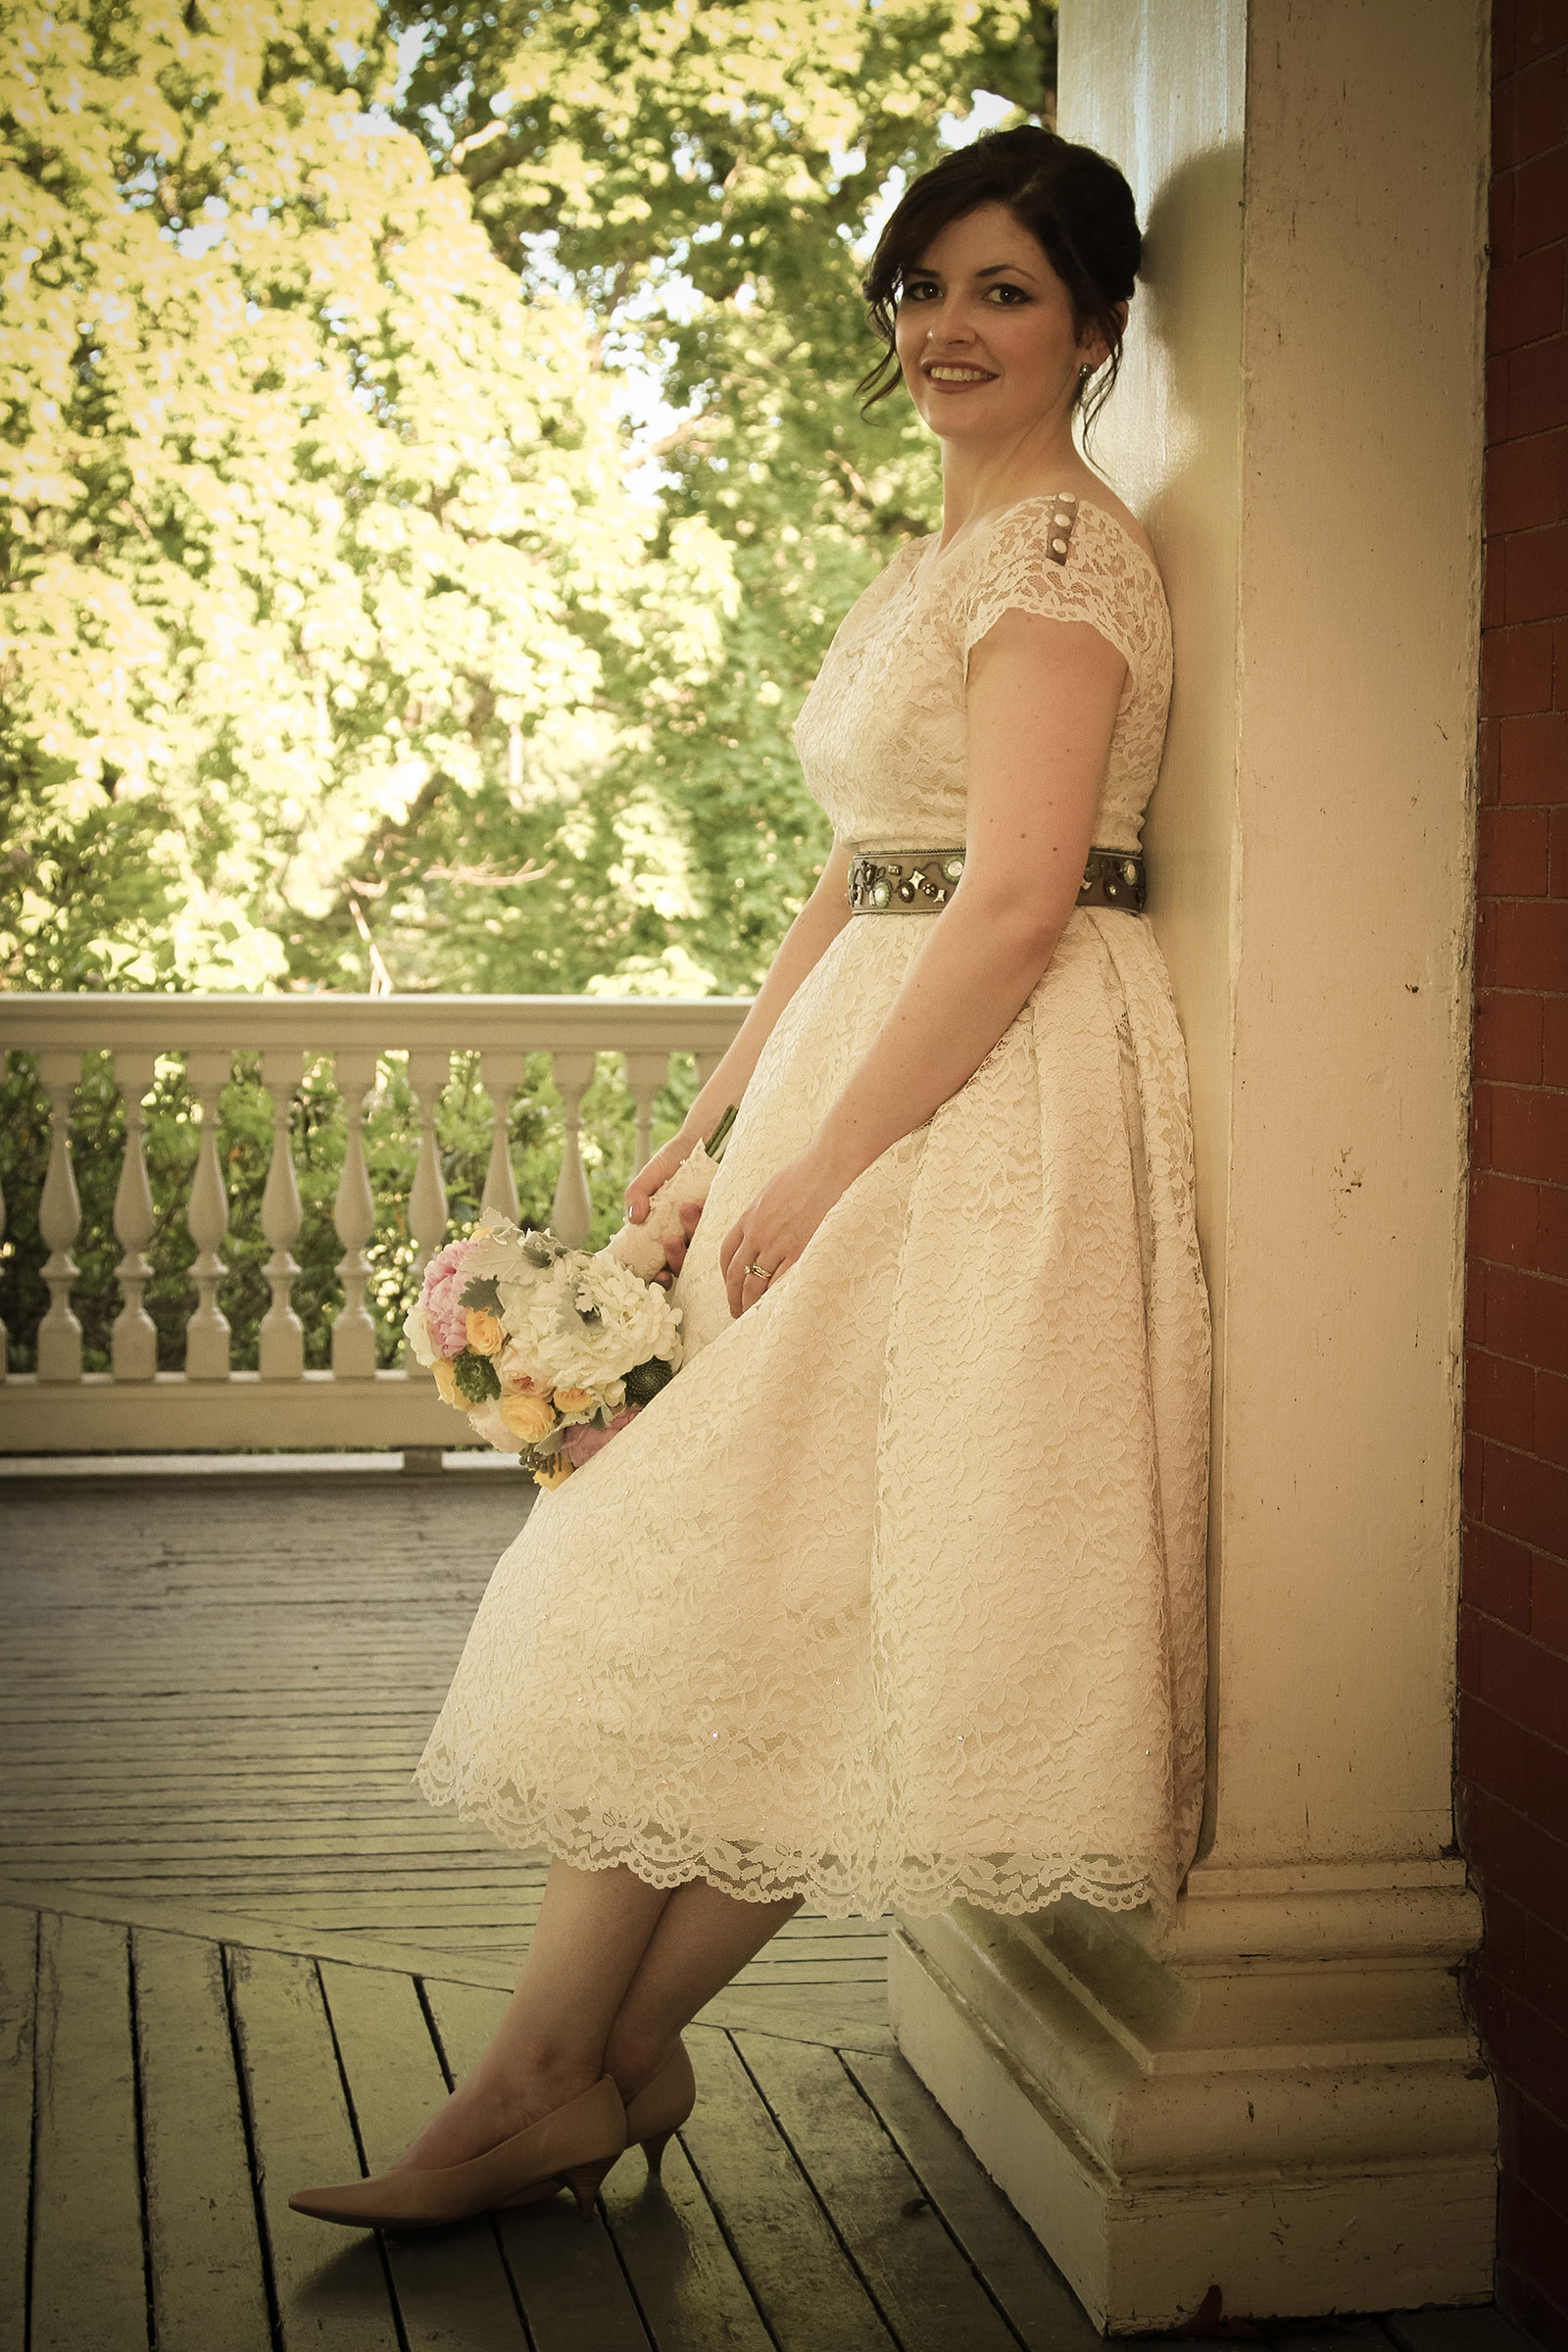 Book adele for wedding